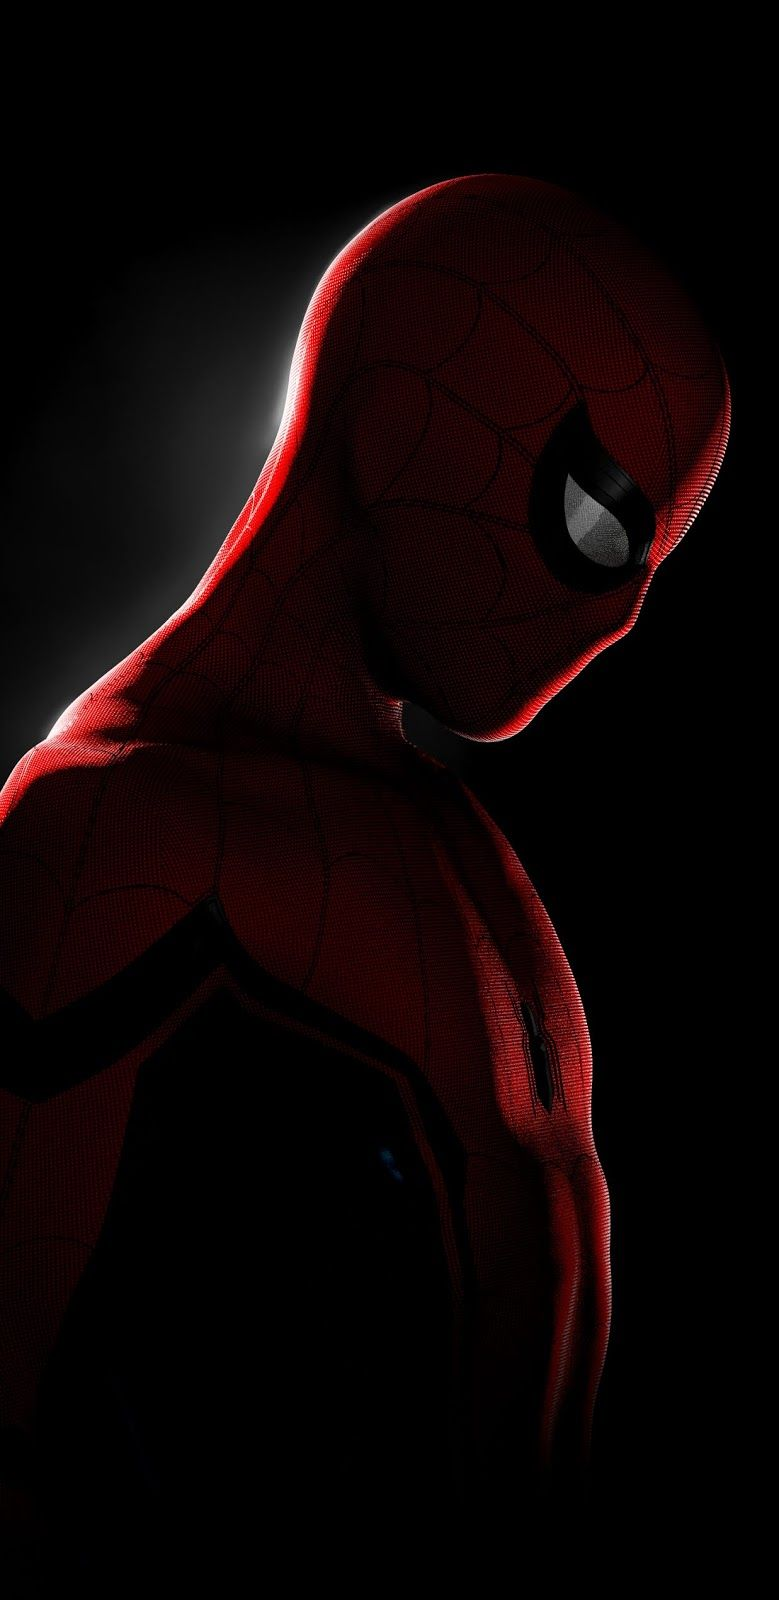 Black Android Wallpaper Spiderman